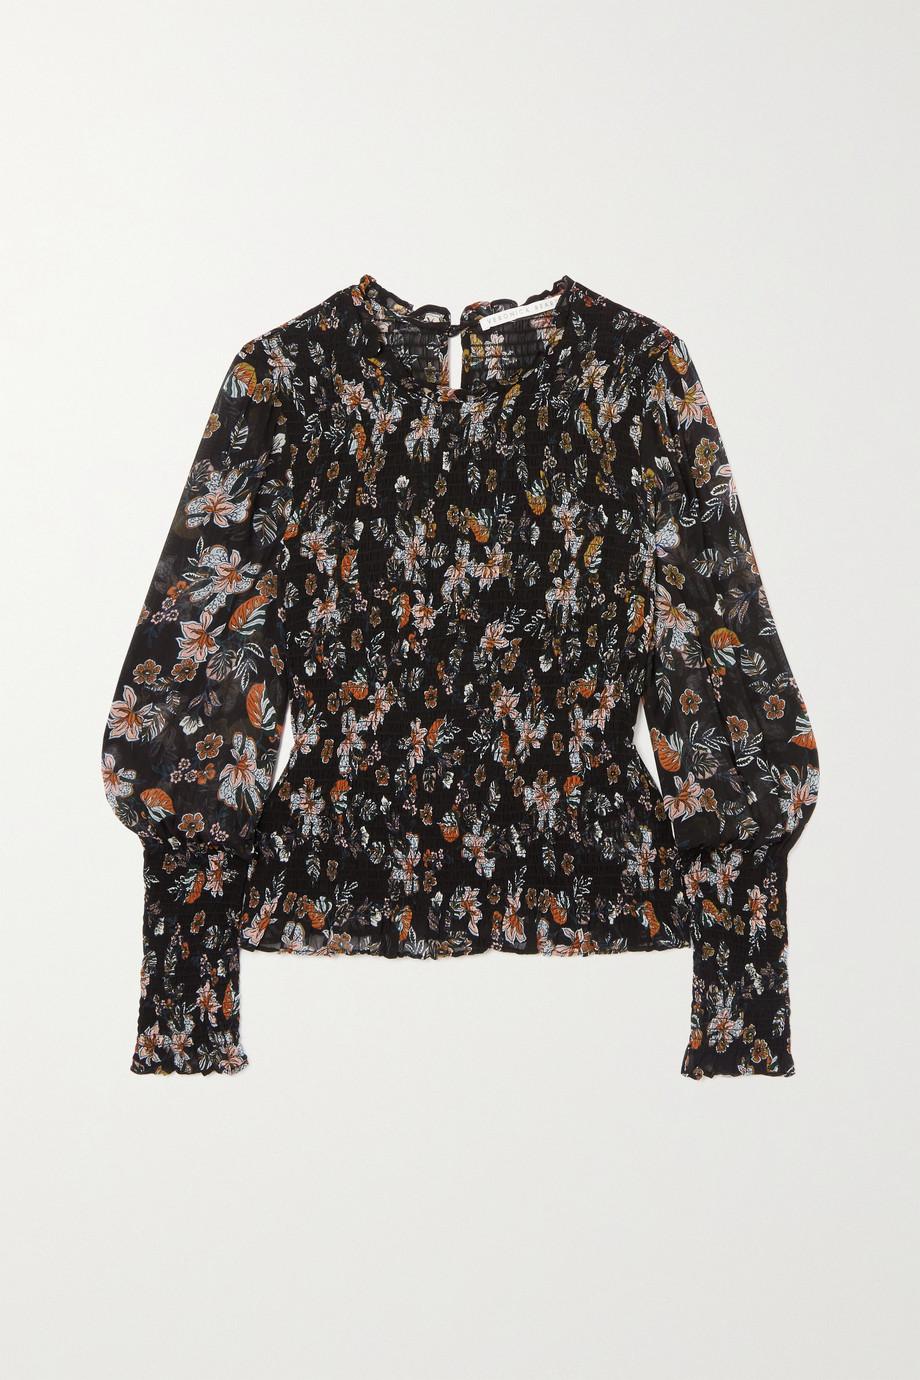 Veronica Beard Faire shirred floral-print chiffon top